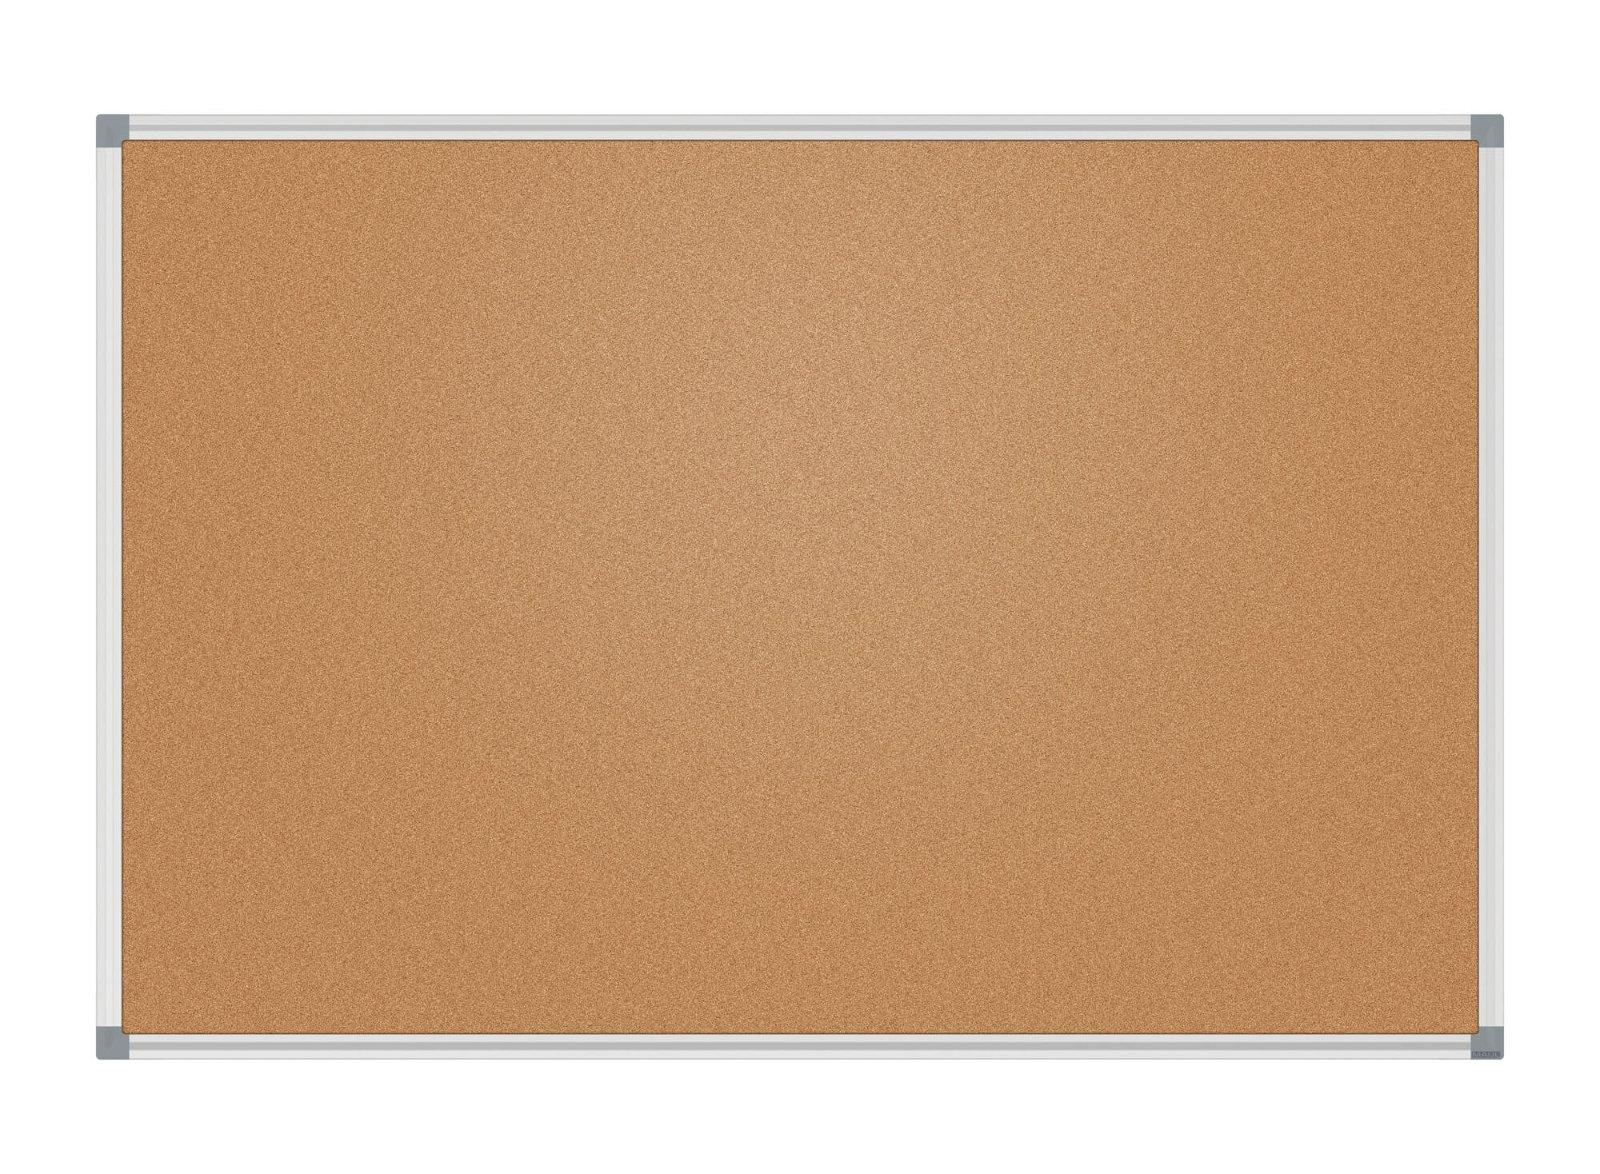 Pinnboard MAULstandard, 60x90 cm, Kork, grau